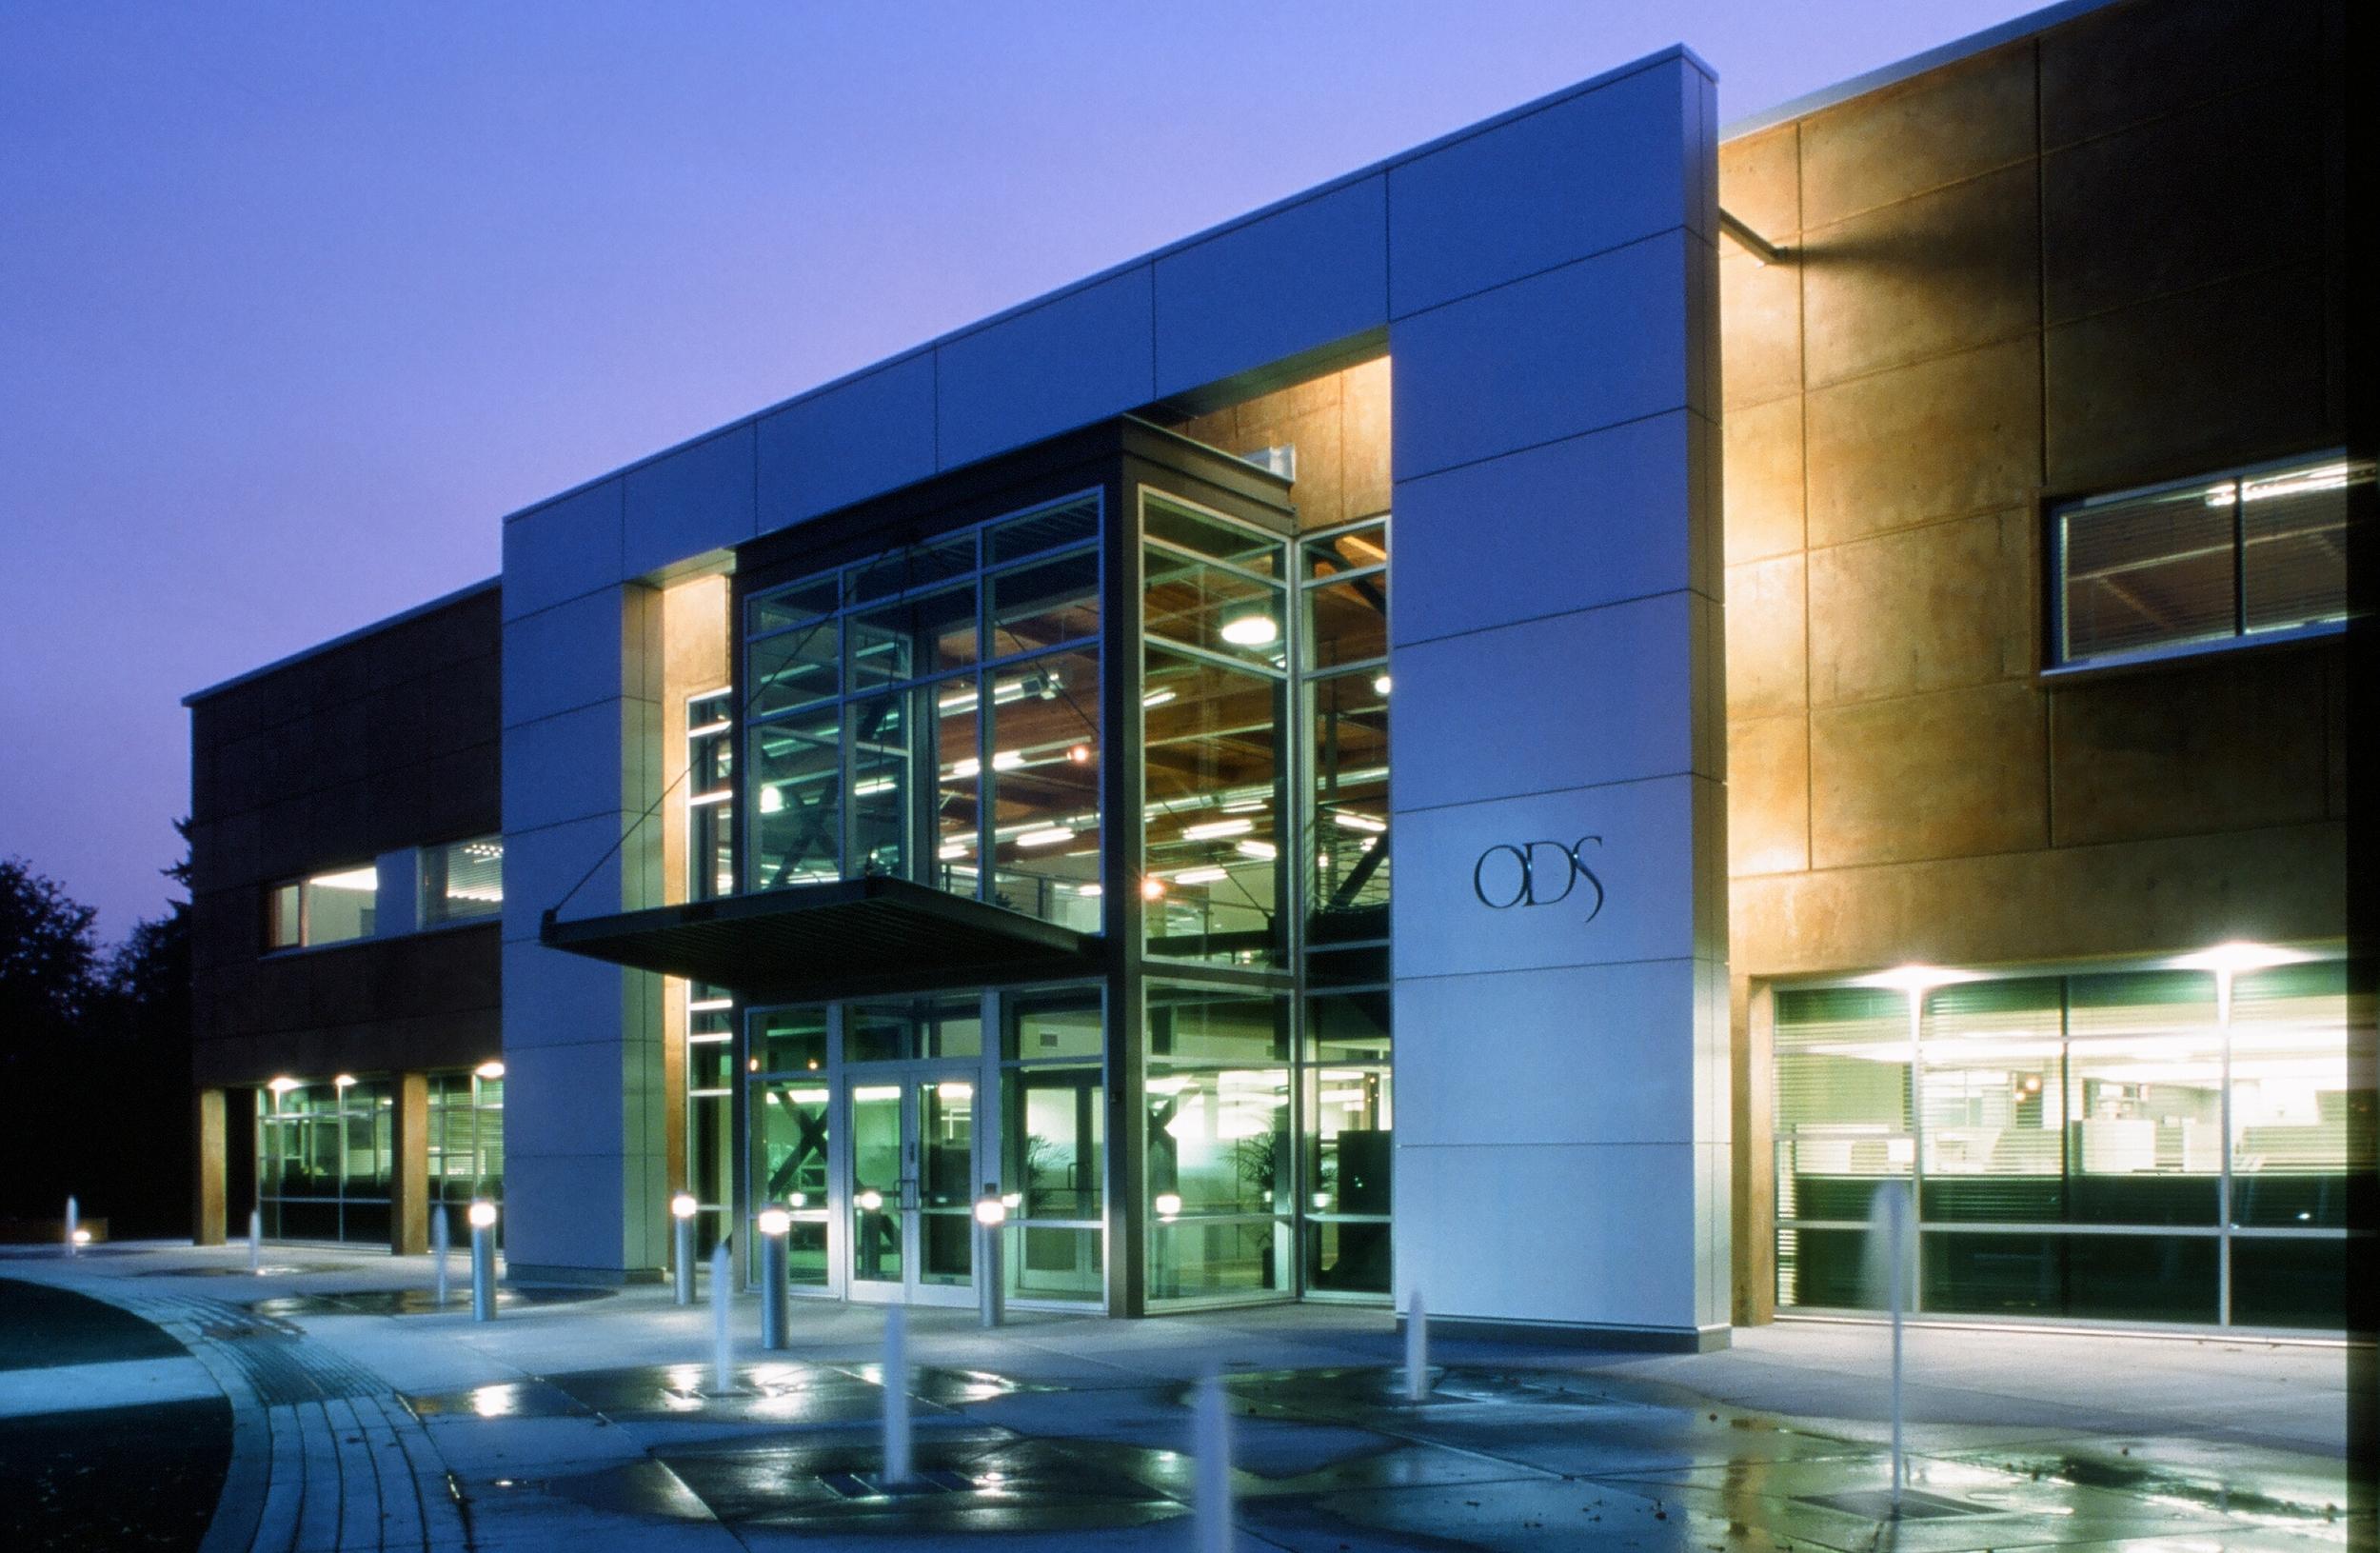 ODS Office Building, Milwaukie, Oregon